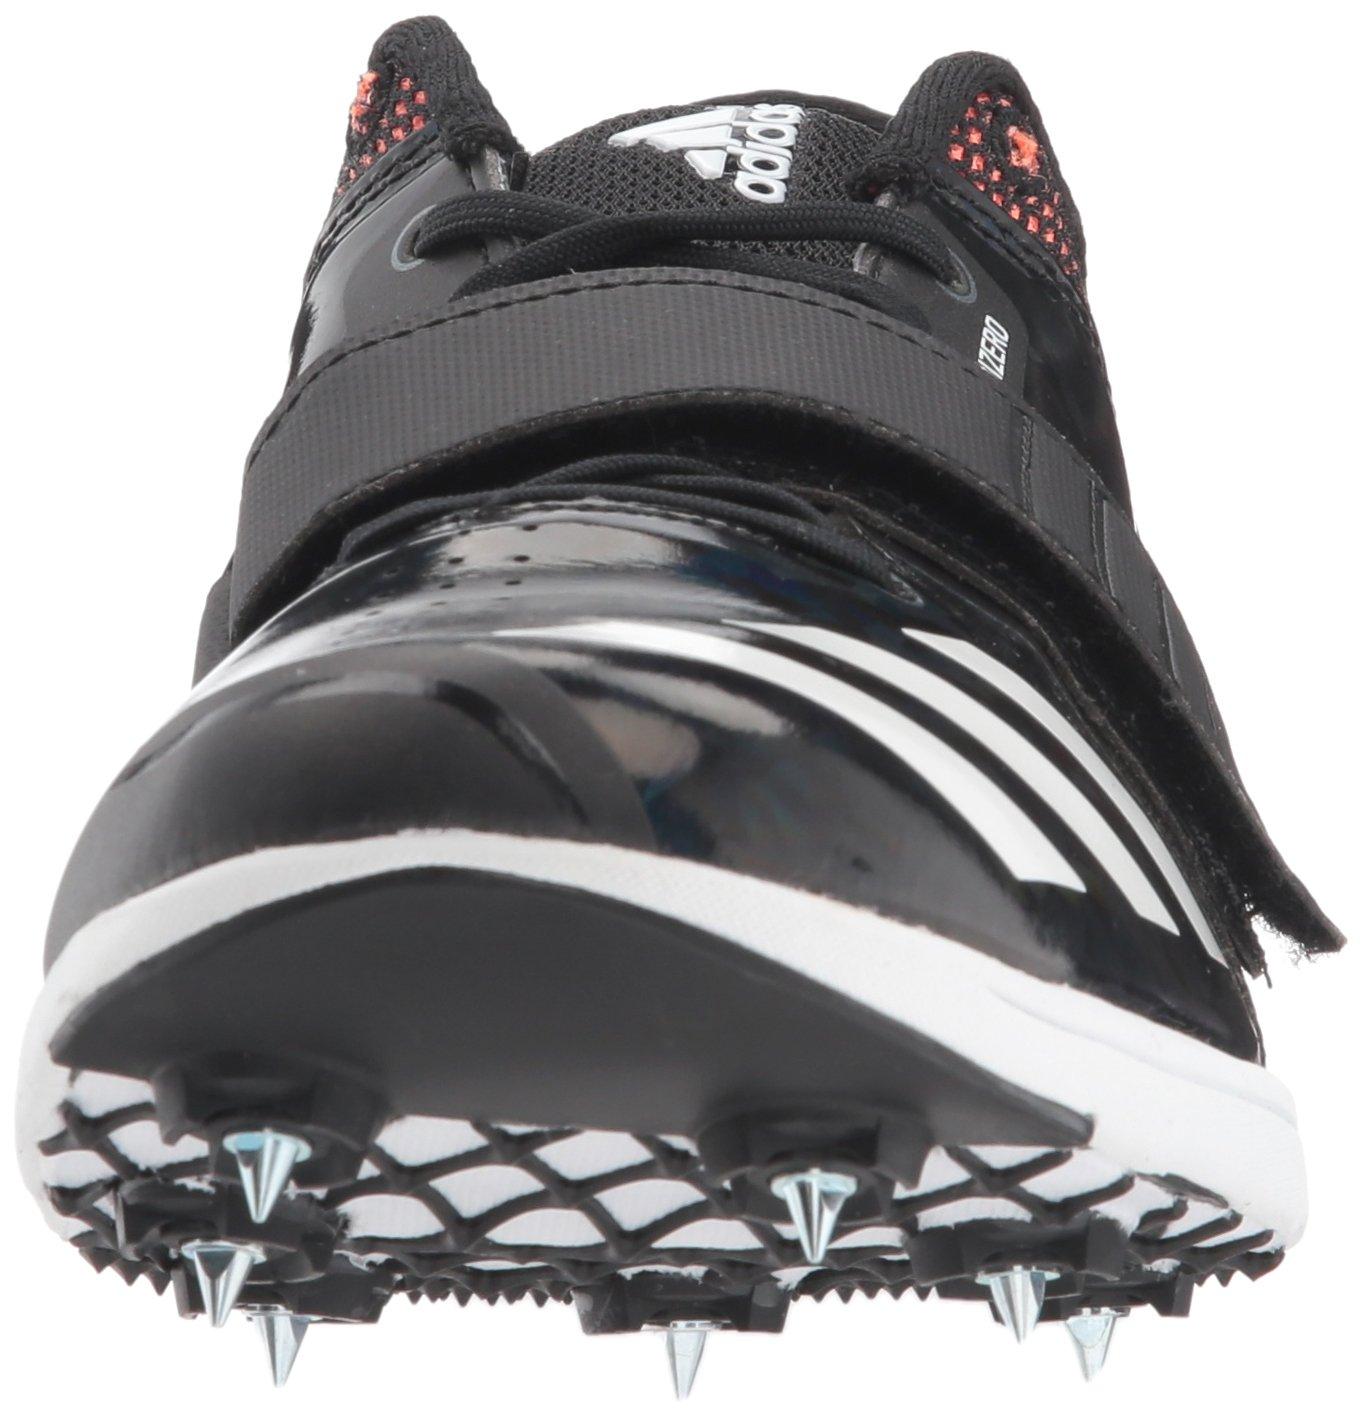 adidas Adizero tj/pv Running Shoe core Black, FTWR White, Orange 13.5 M US by adidas (Image #4)